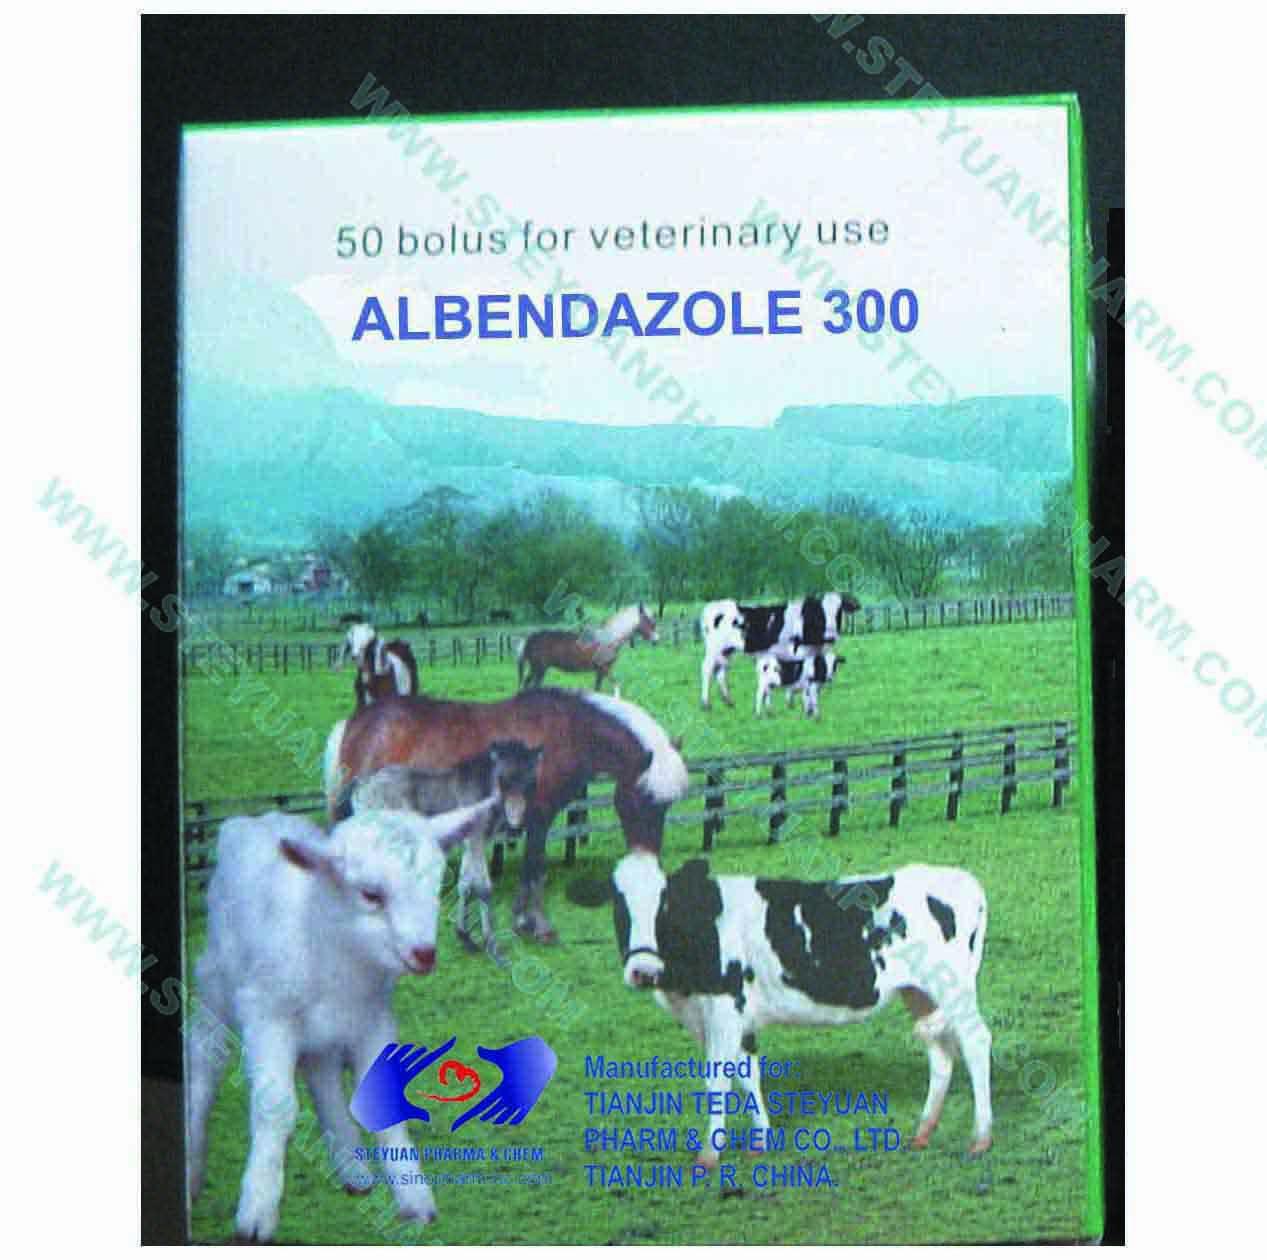 Albendazole tablet (veterinary use)